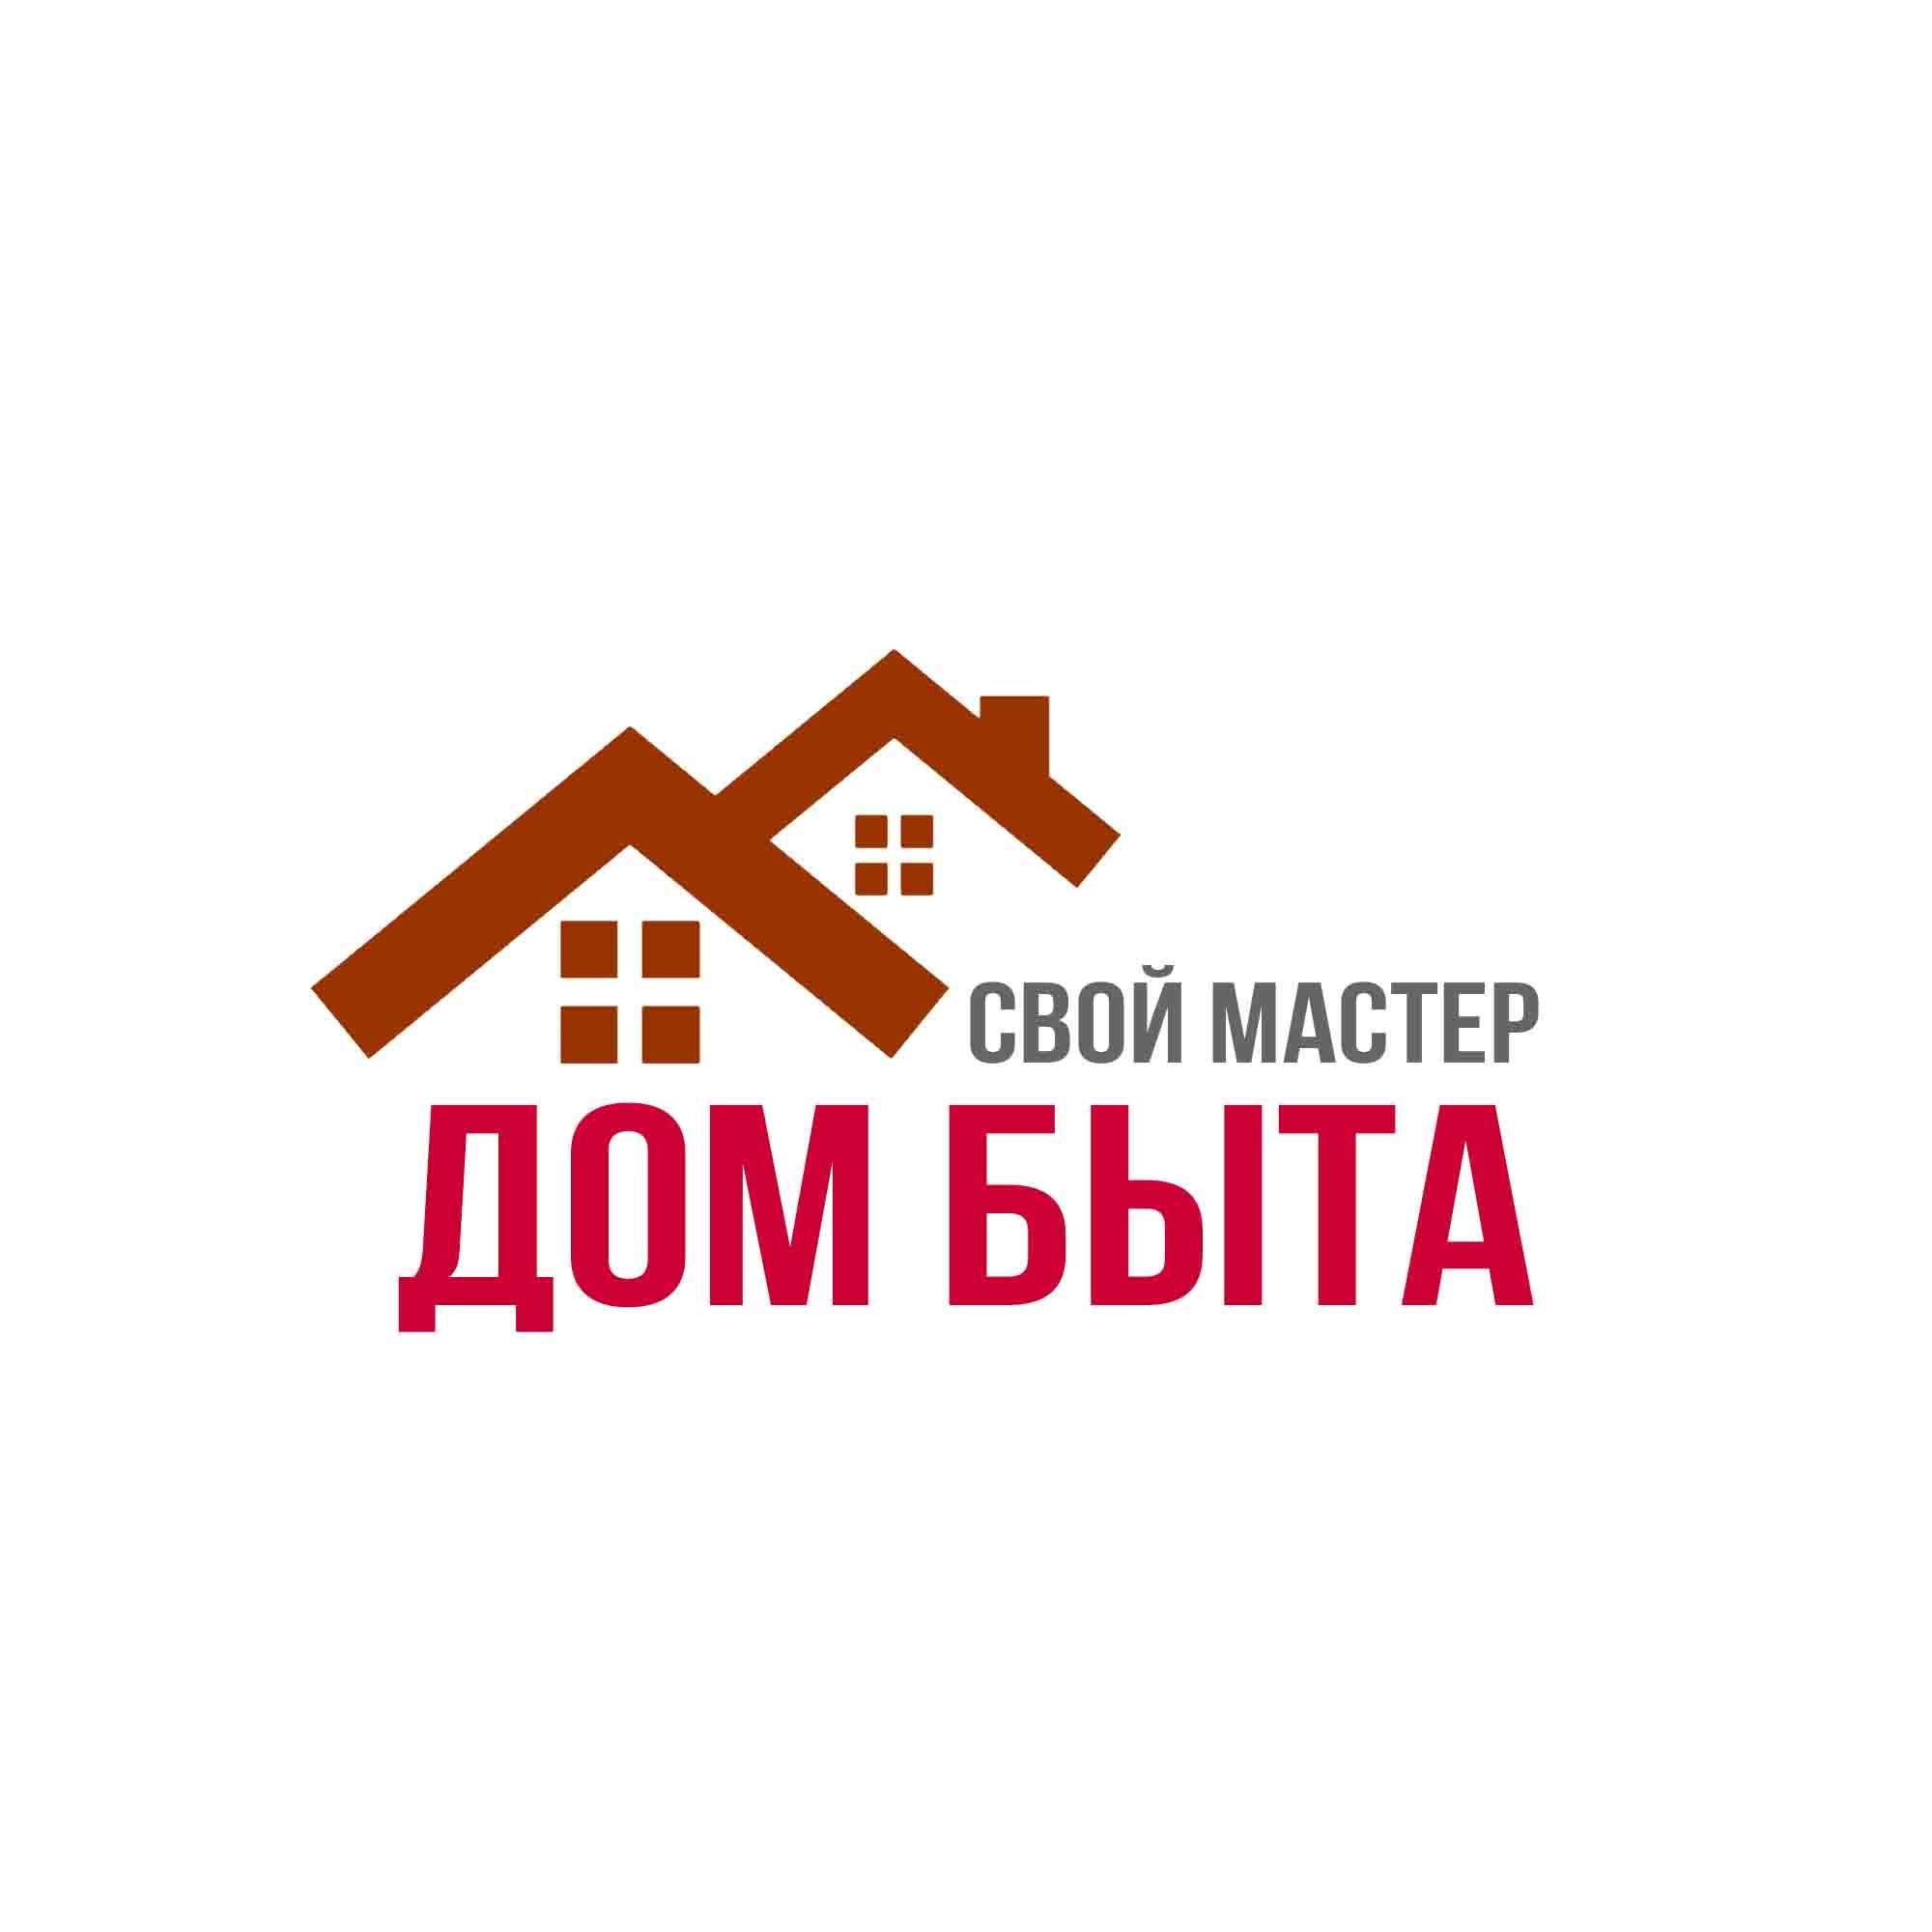 Логотип для сетевого ДОМ БЫТА фото f_3695d72409933029.jpg